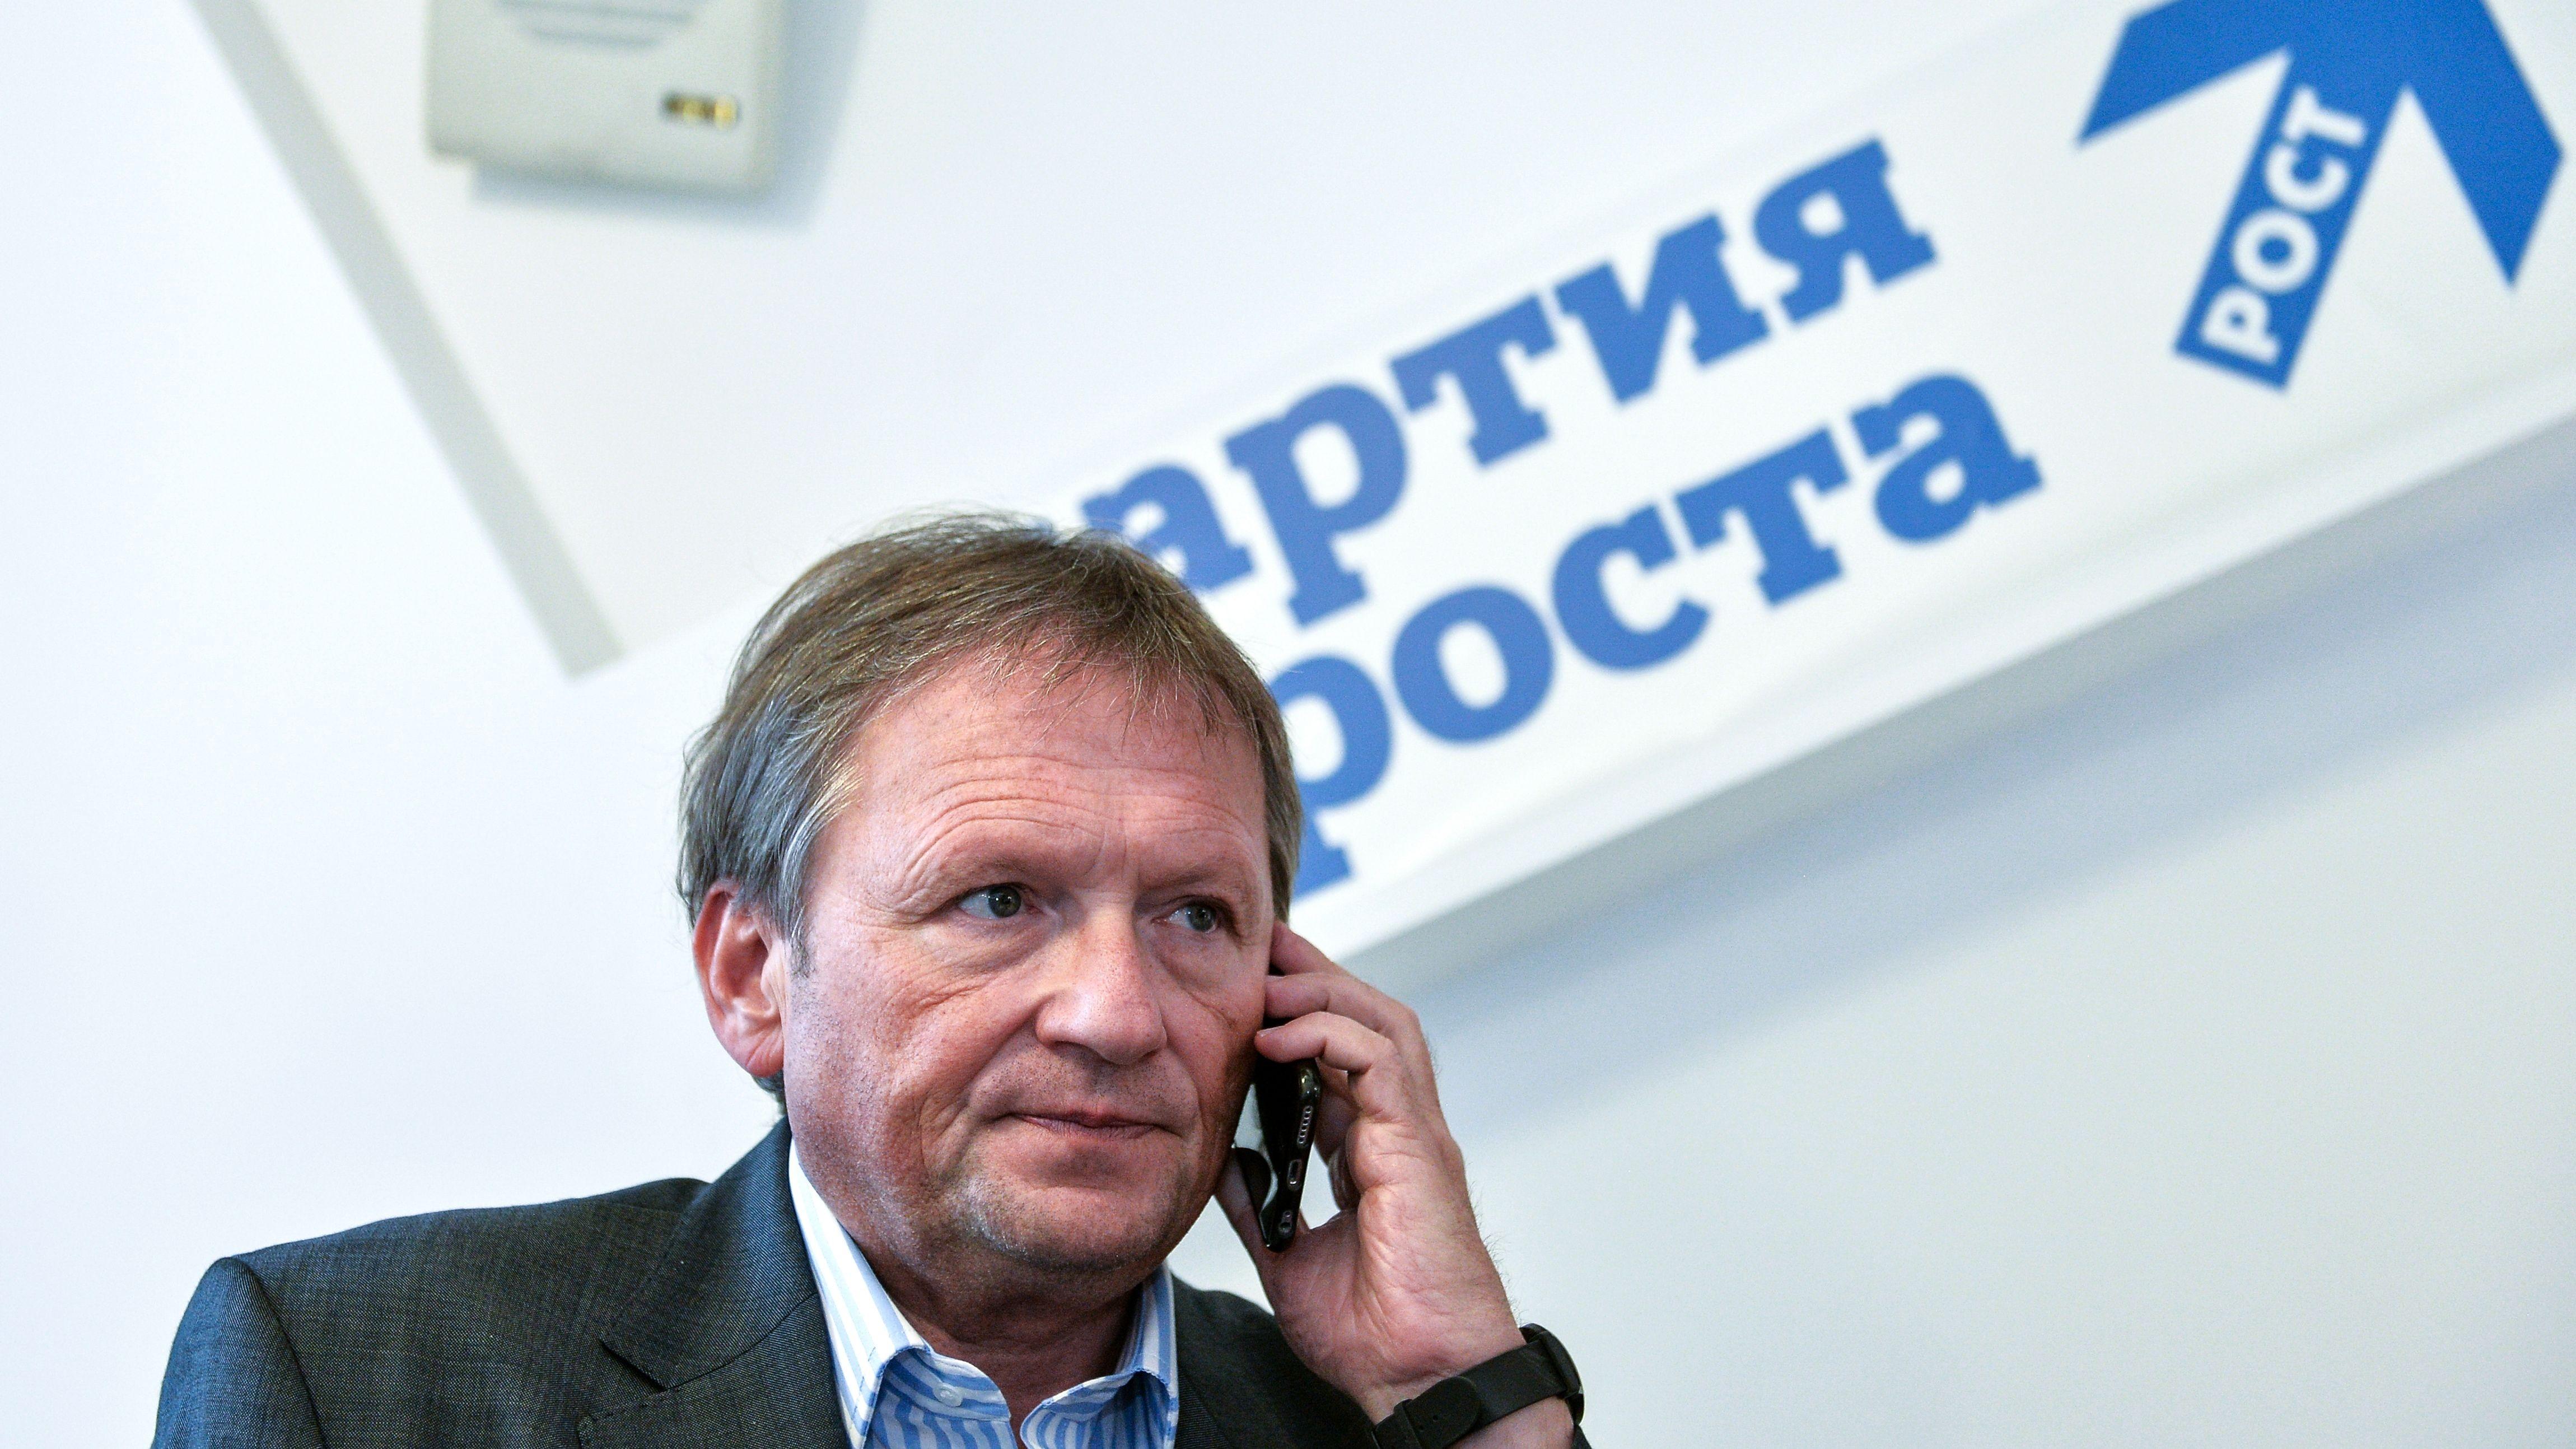 <p>Фото: &copy; РИА Новости/Владимир Песня</p>